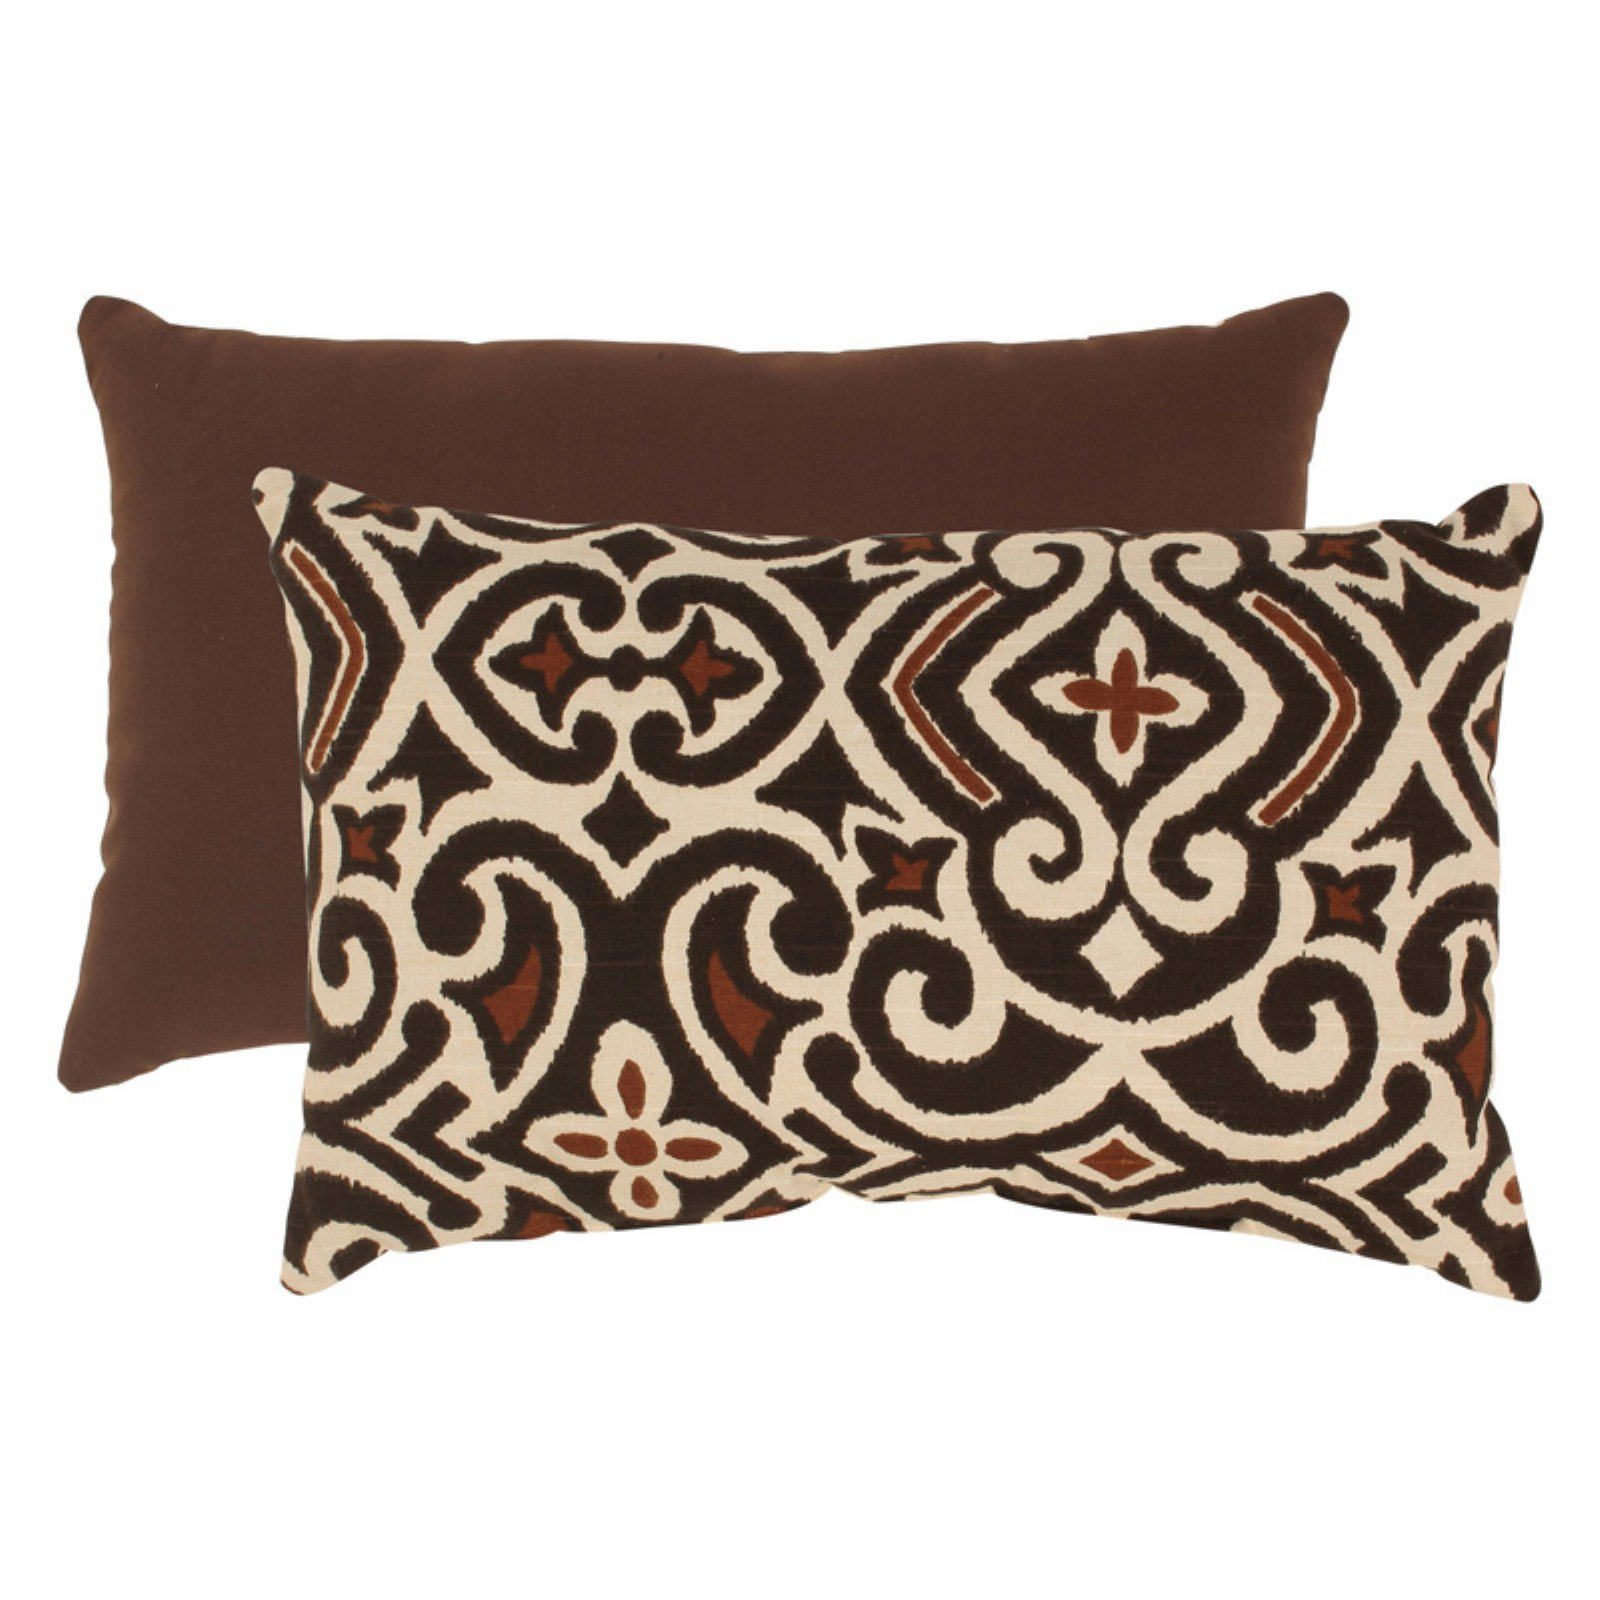 Pillow Perfect Brown and Beige Damask Rectangular Throw